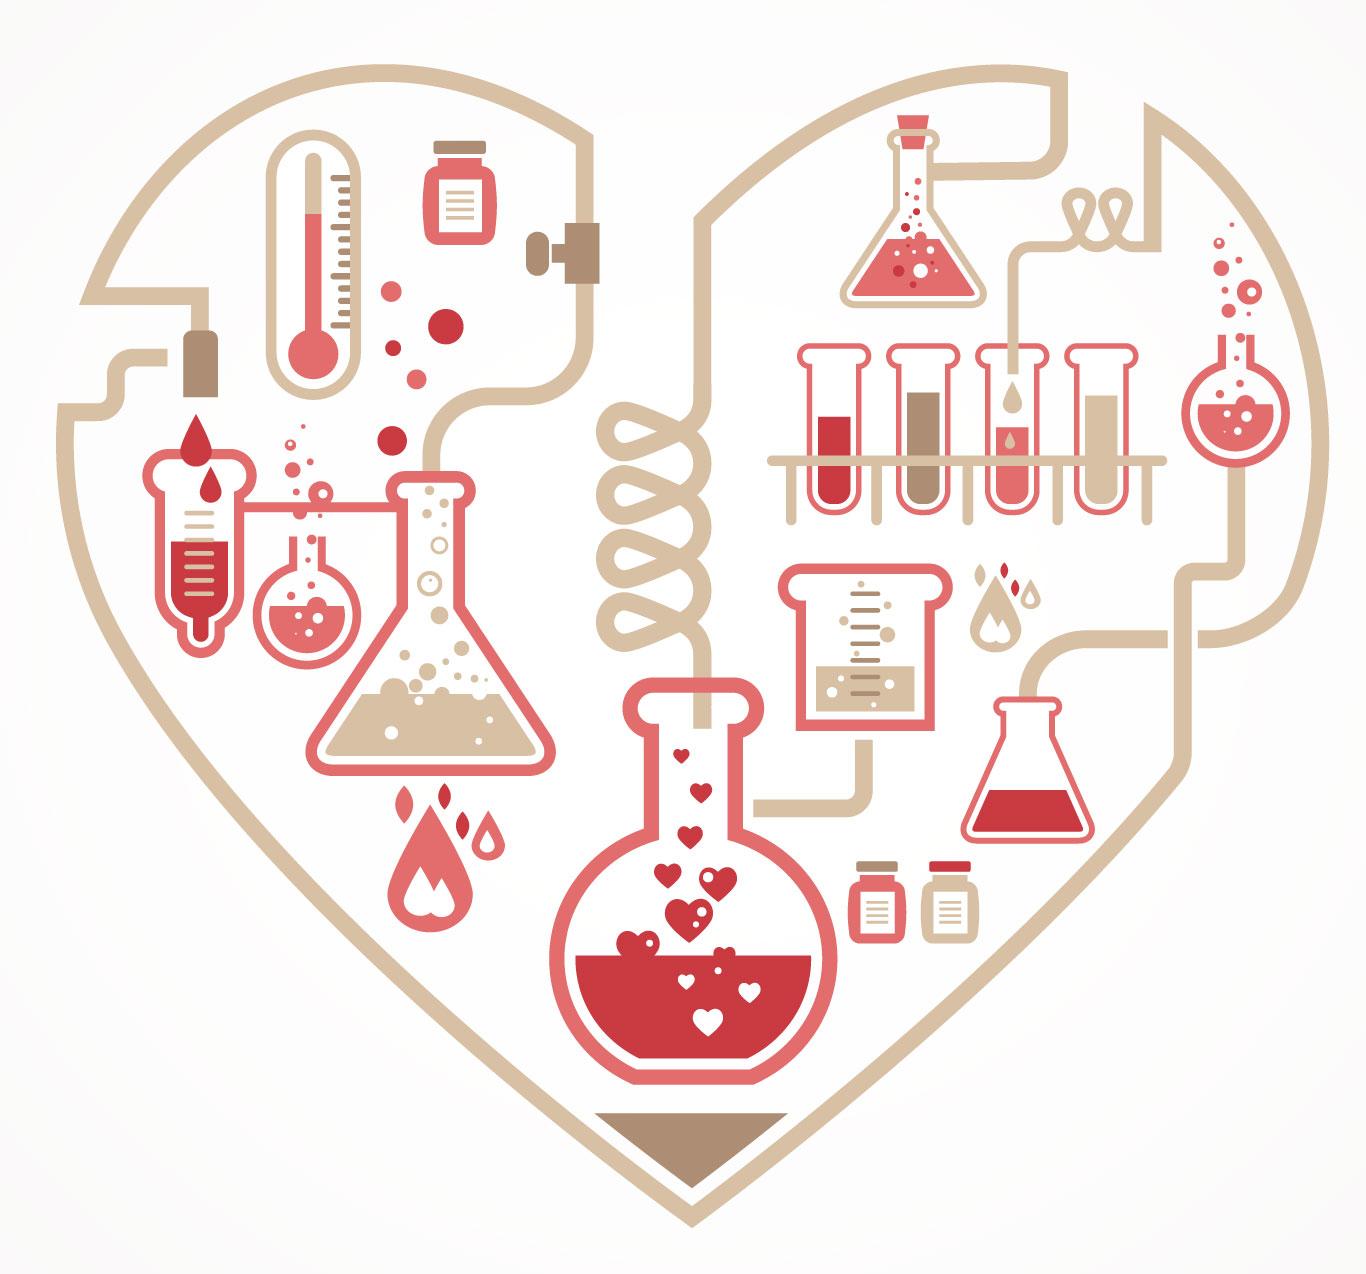 Science-Valentines-STEM-1366-0218.jpg